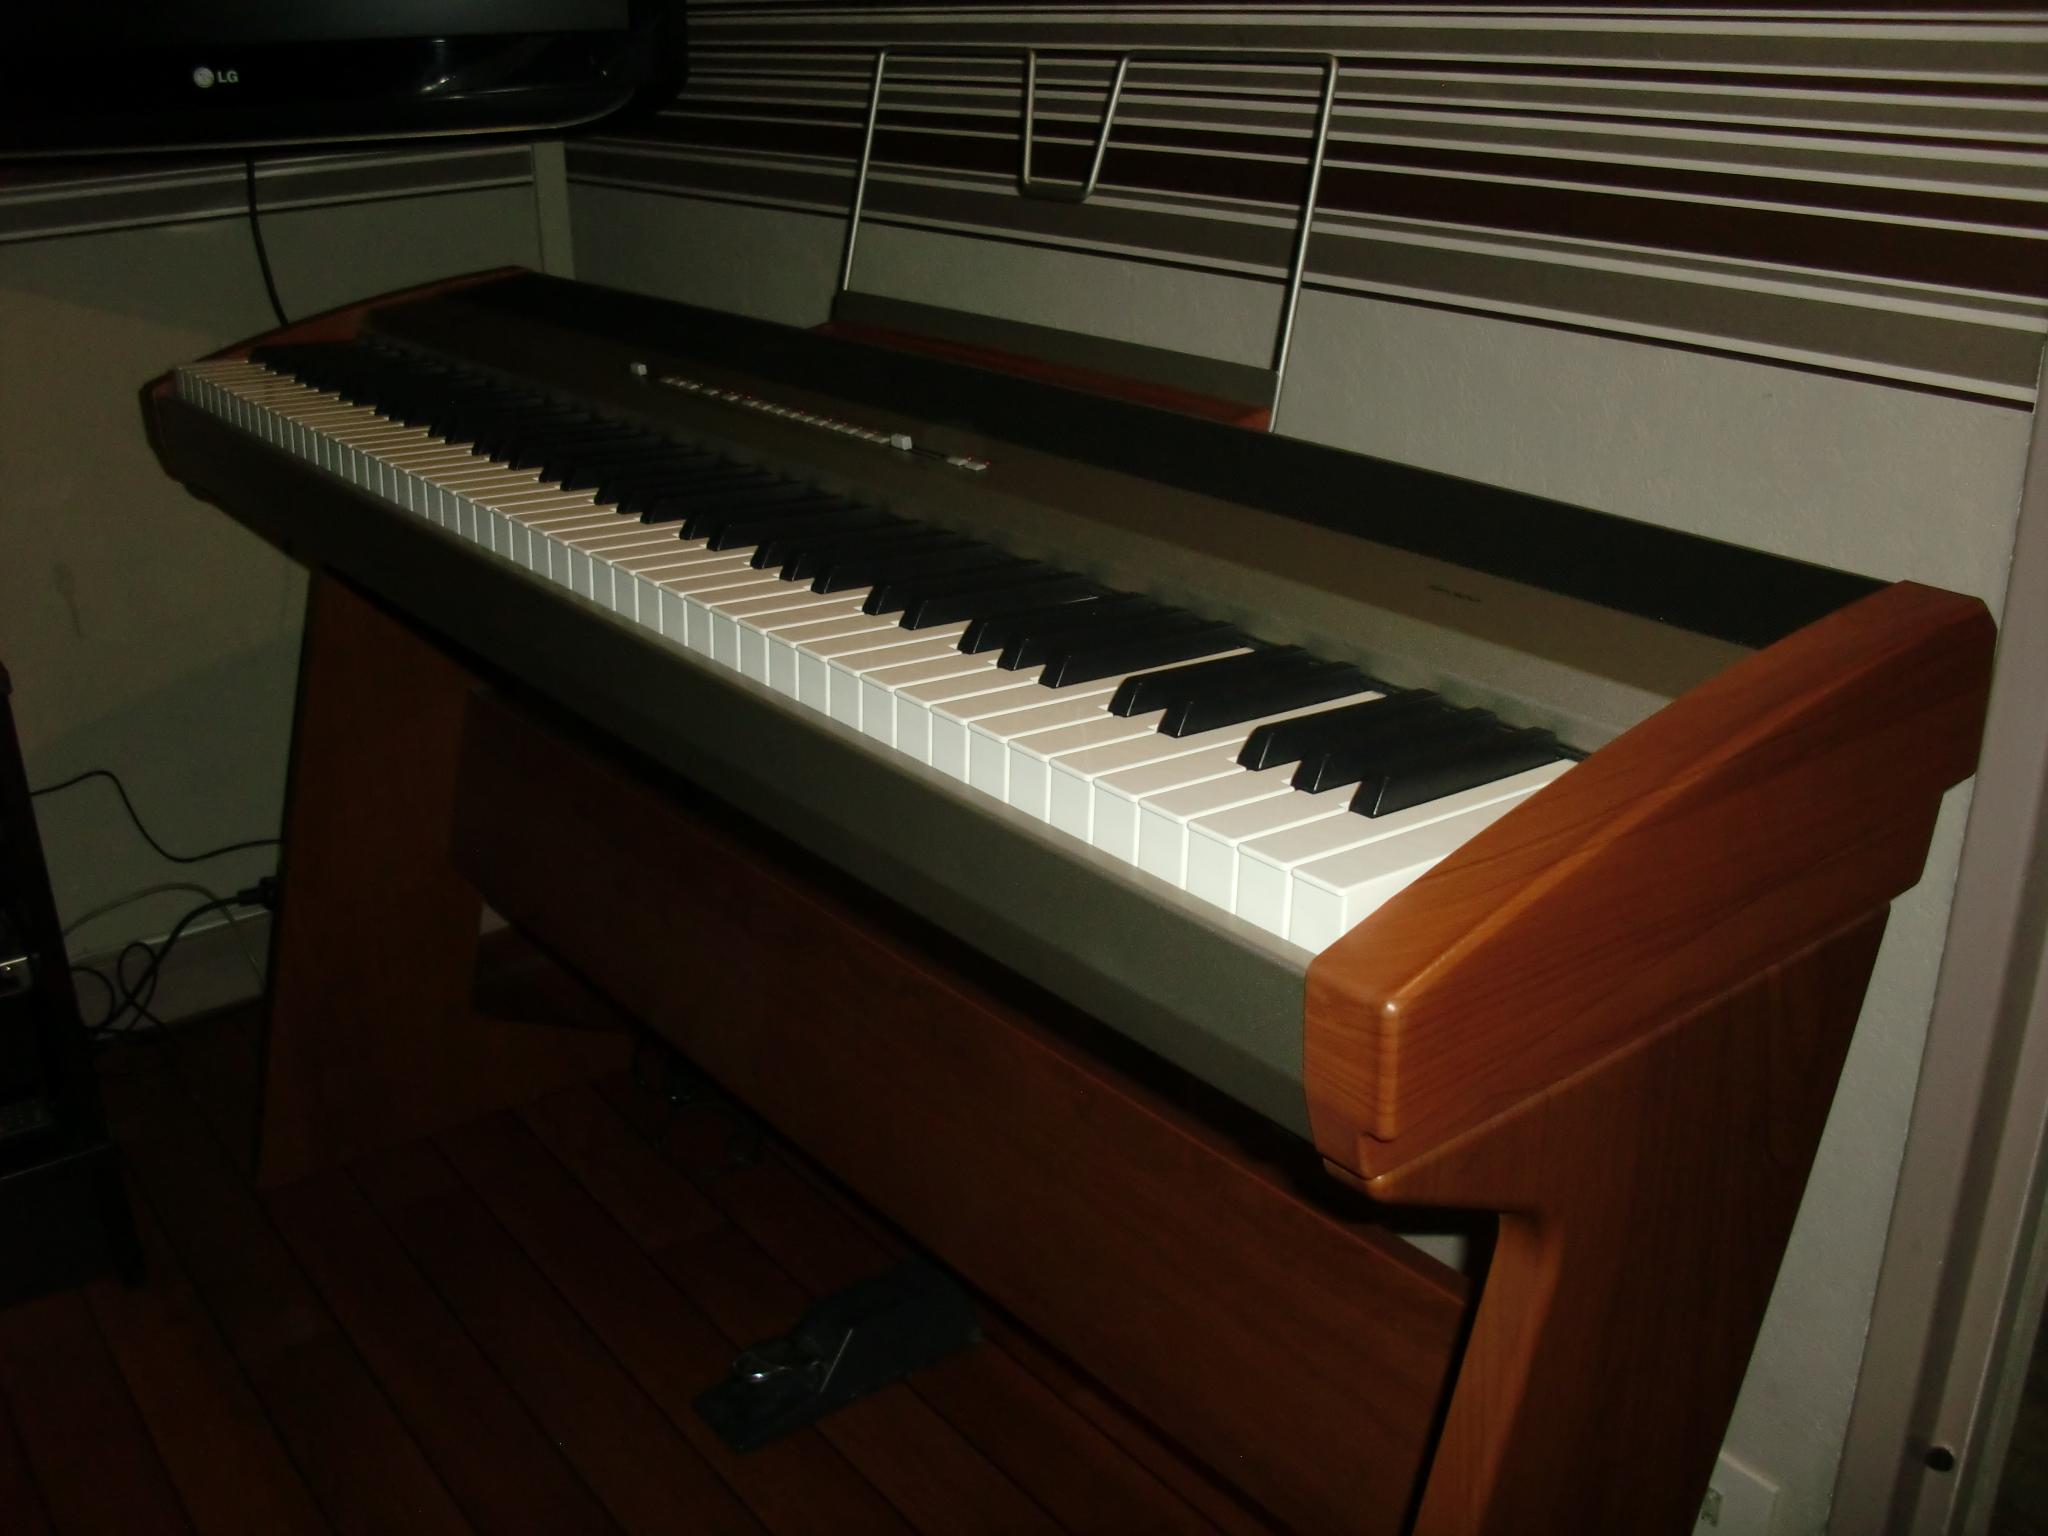 piano korg sp 300 ile de france audiofanzine. Black Bedroom Furniture Sets. Home Design Ideas